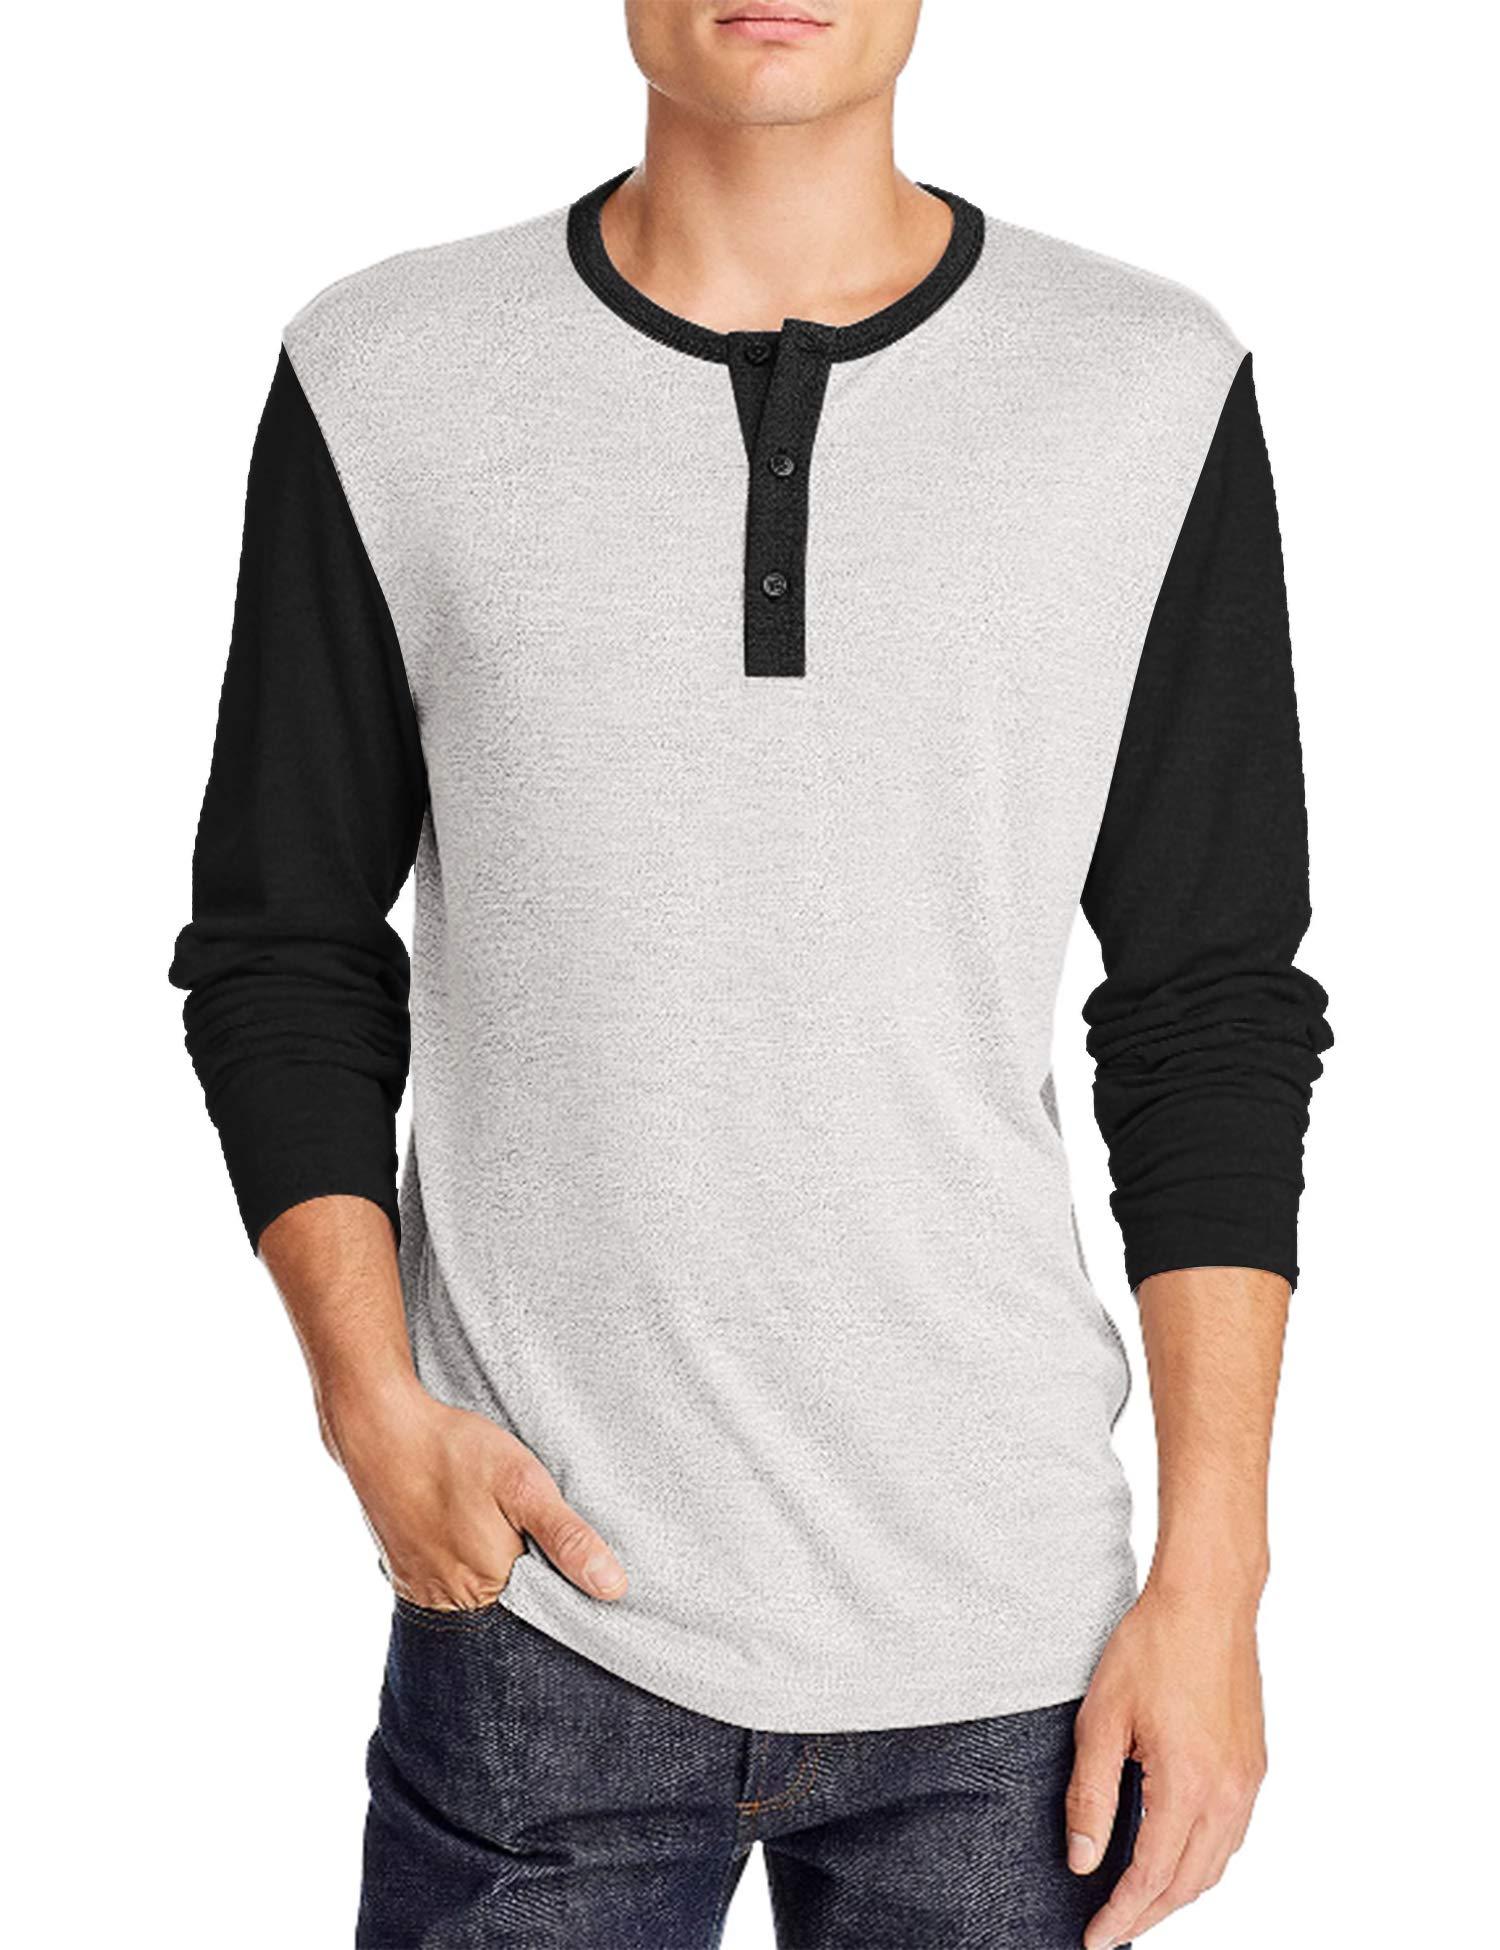 COOFANDY Men's Long Sleeve Athletic Henley Shirt Active Jerseys Tee Regular Fit T-Shirt Grey Black XL